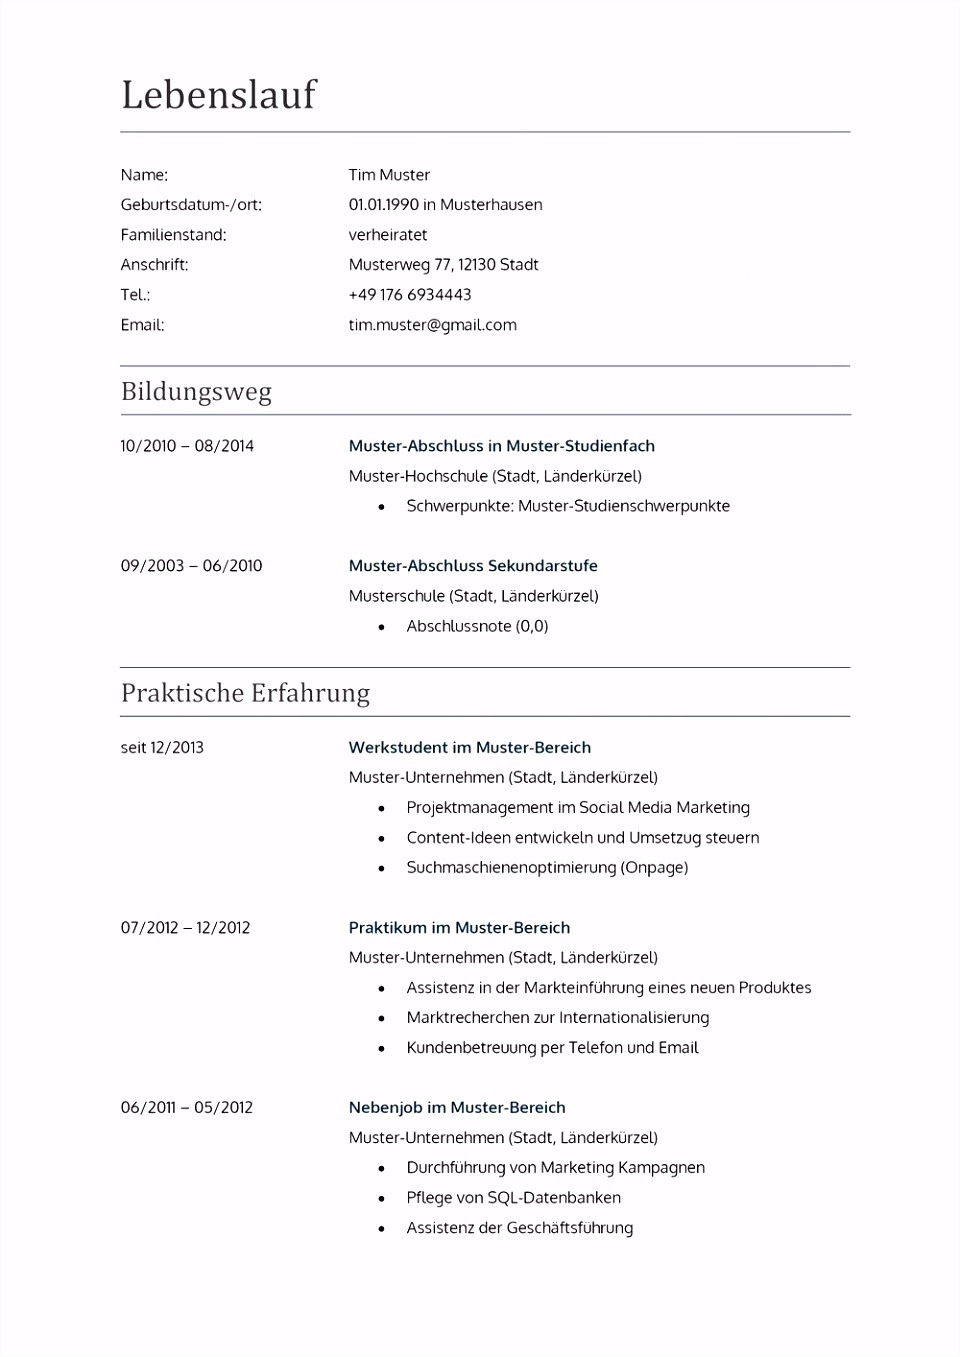 Vorlage Lebenslauf Lehrer Lebenslauf Muster Für Lehrer Lebenslauf Designs Lebenslauf Lehrer P1pu45hub2 C0rshhher6